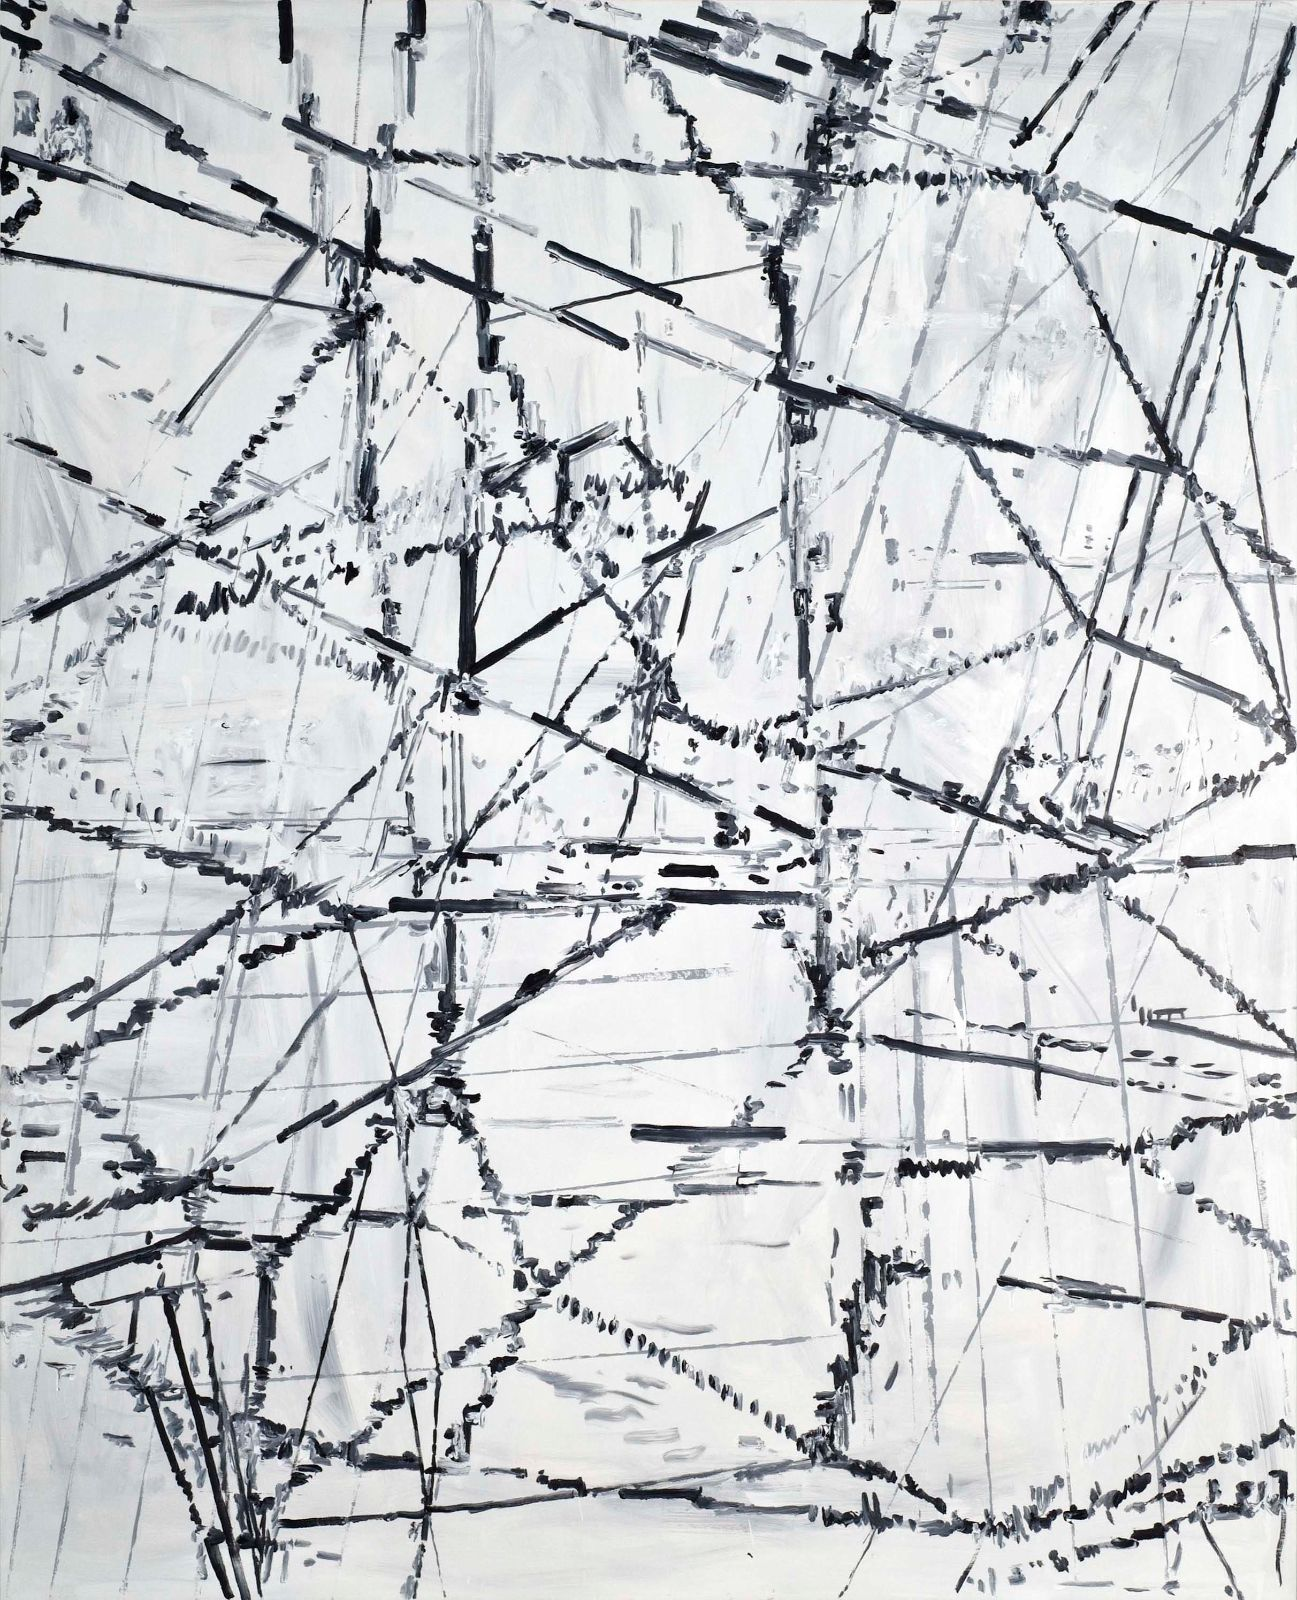 Untitled, 2008, acrylic on canvas, 250 x 200 cm